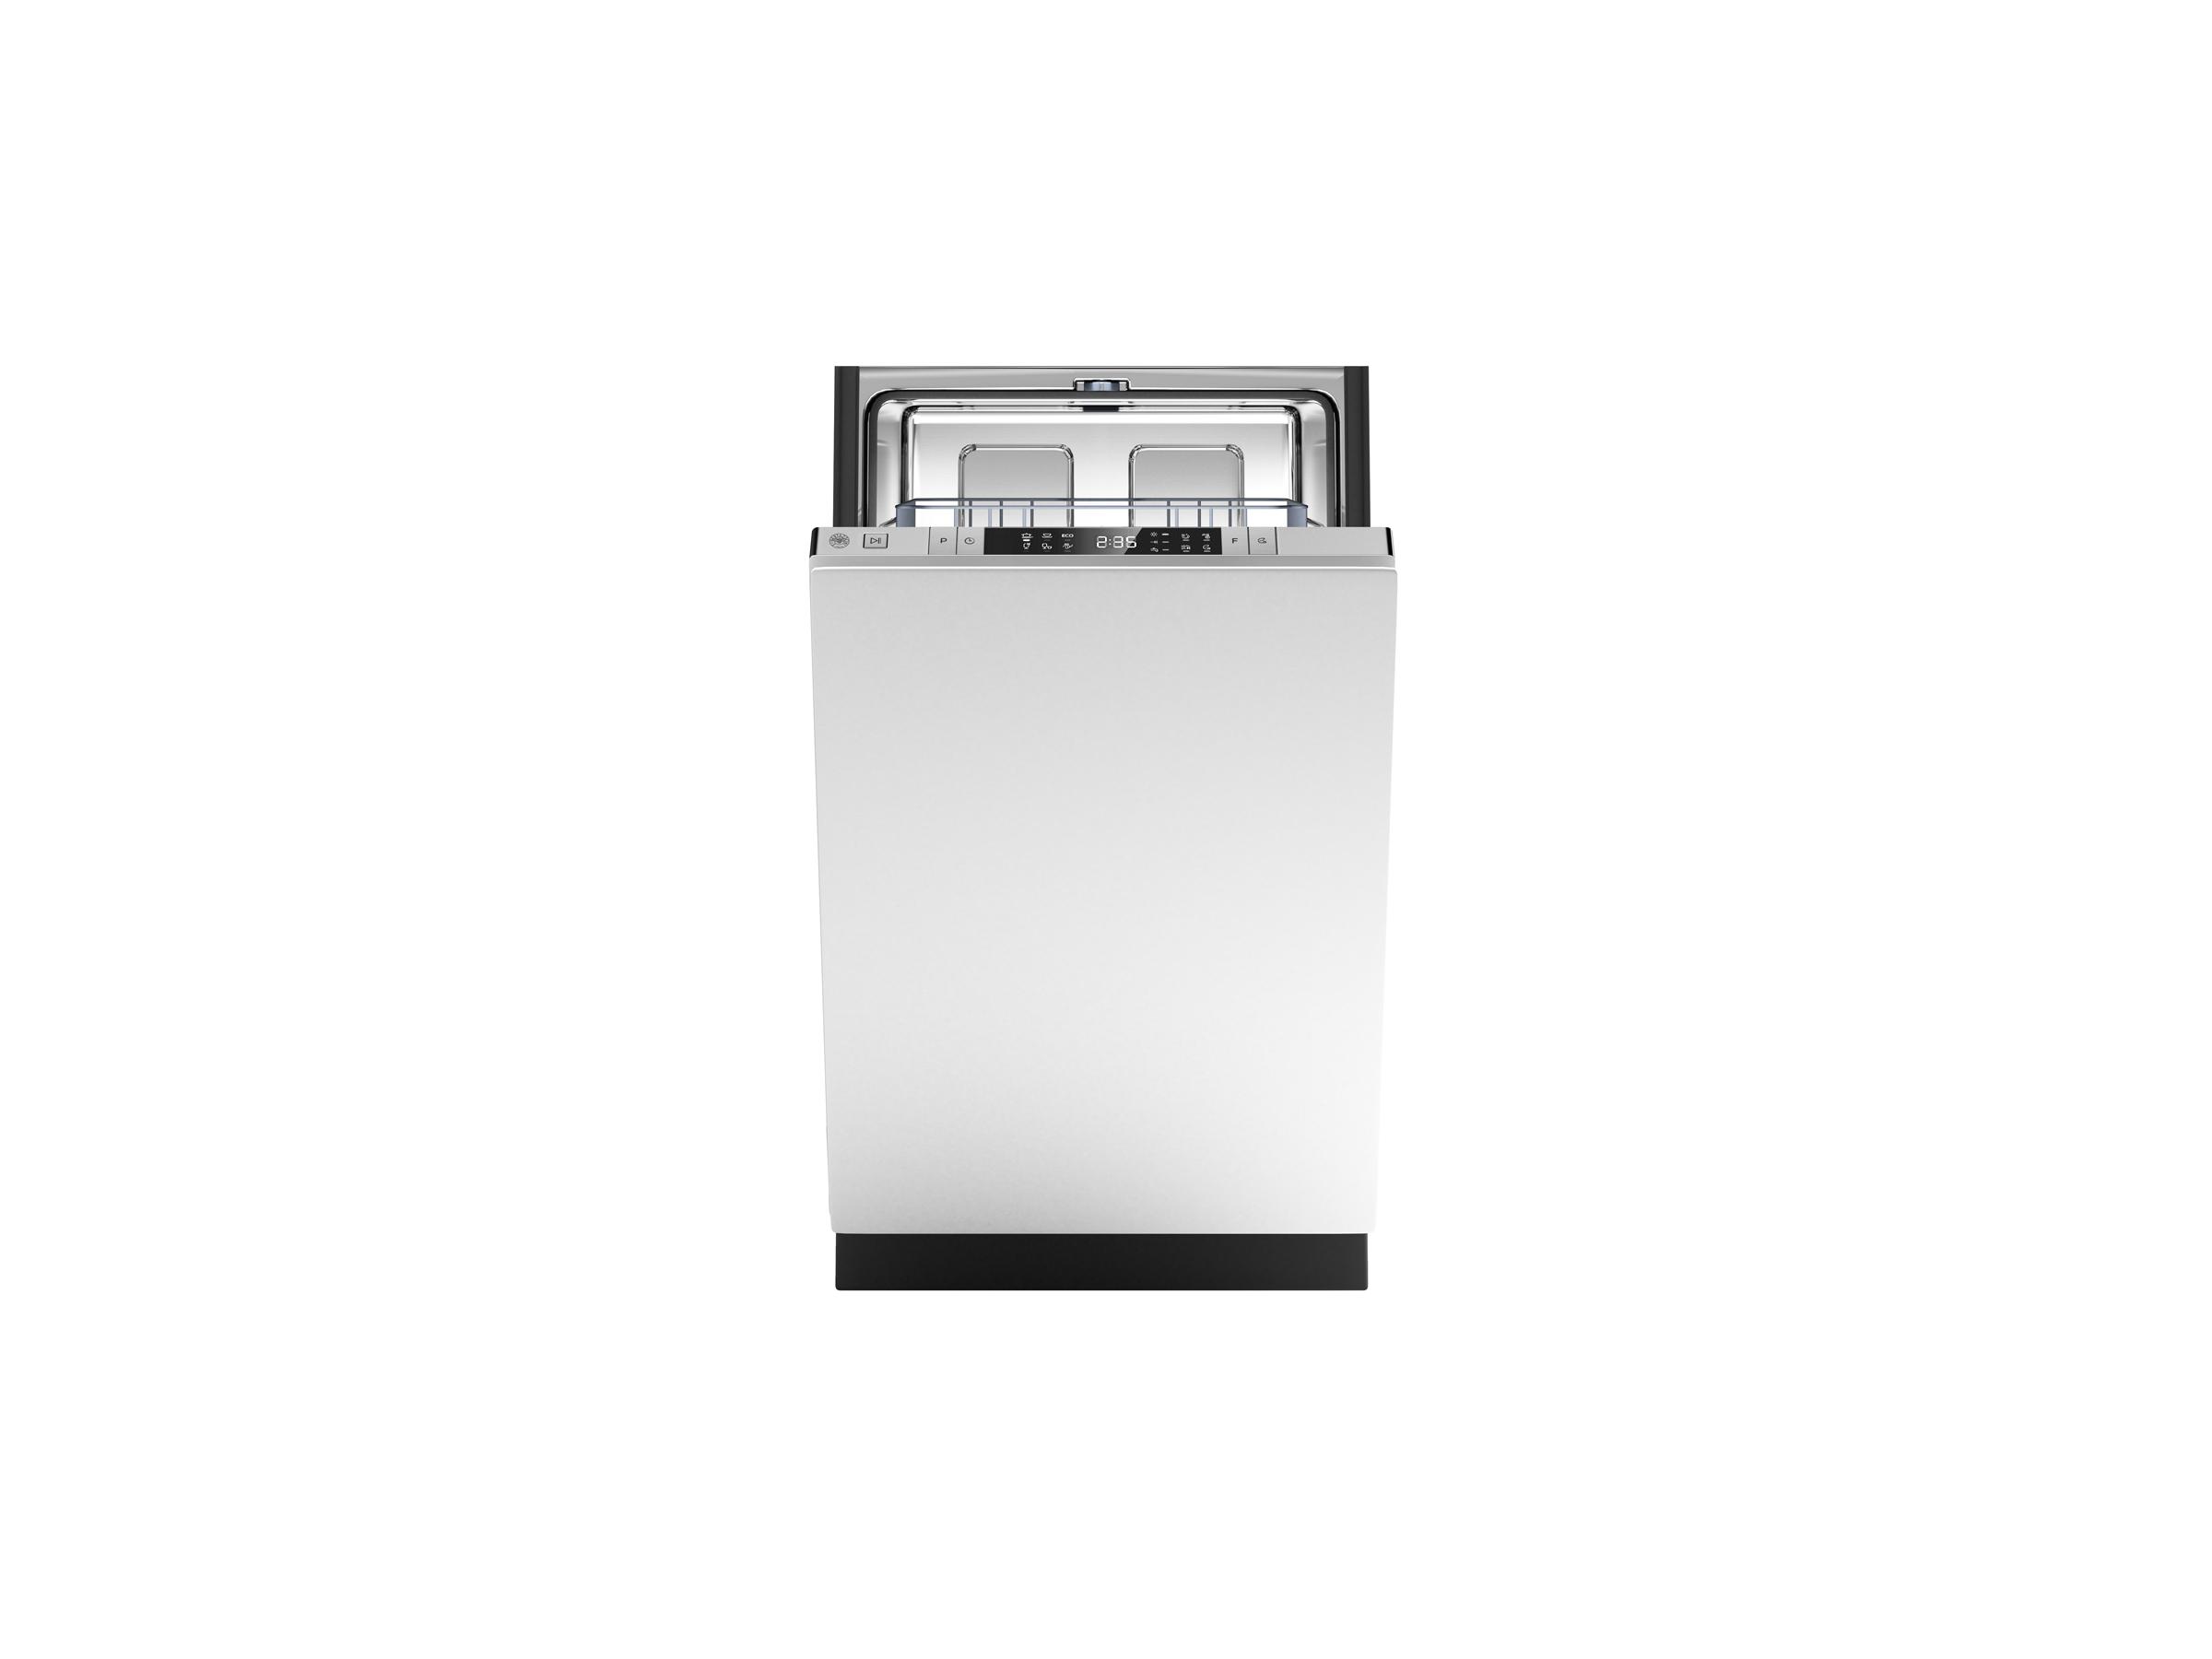 18 Panel Ready Dishwasher 8 Settings 49db Bertazzoni Stainless